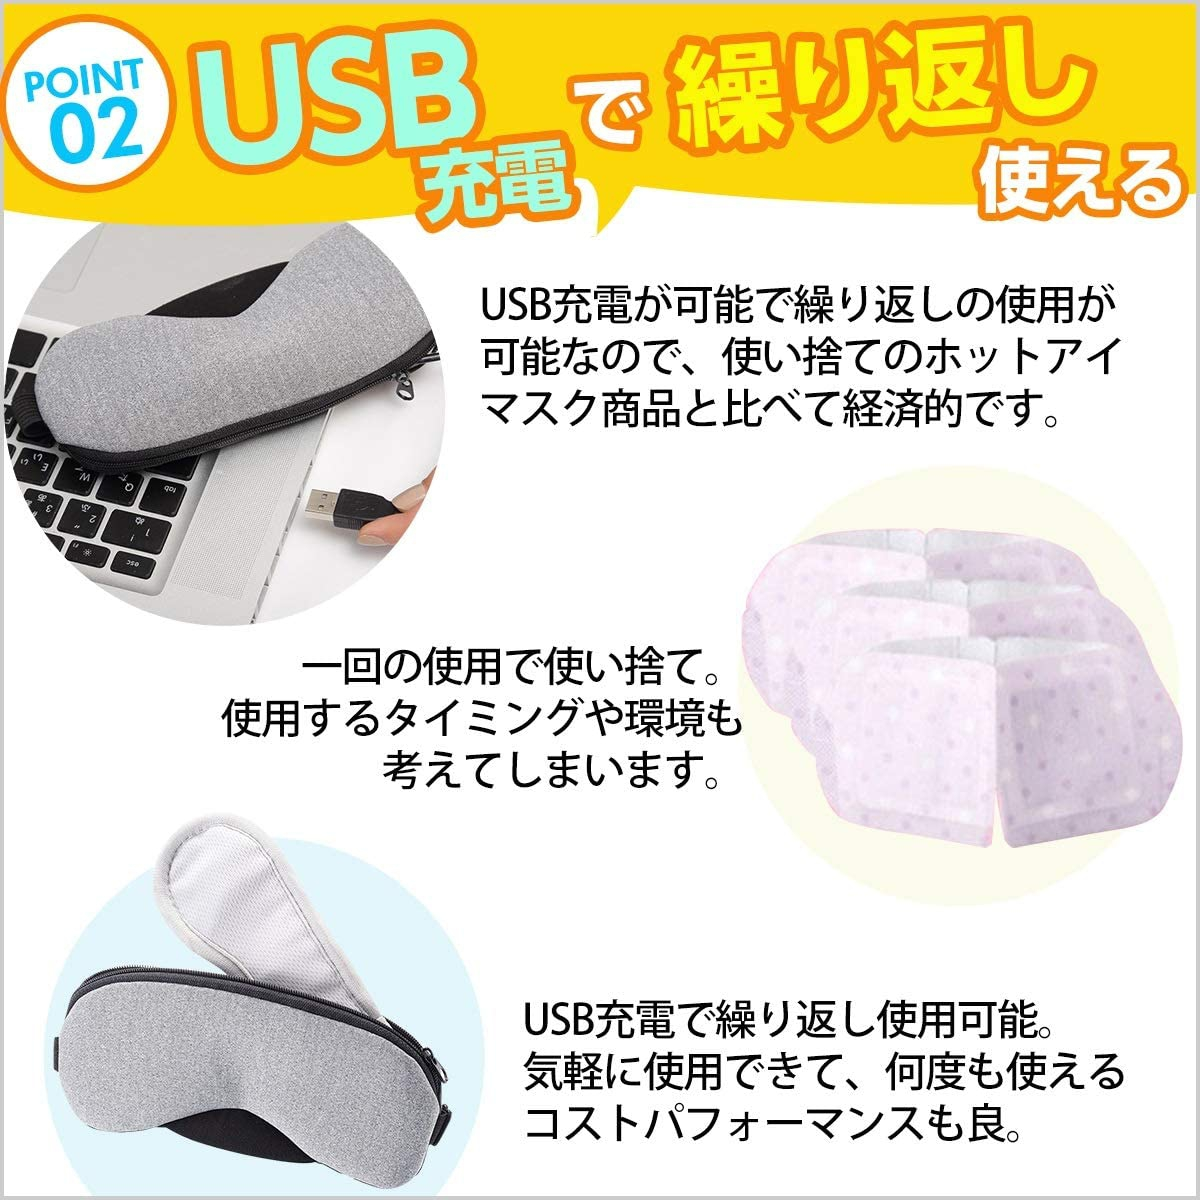 You&Me ホットアイマスク USBアイマスクの商品画像5